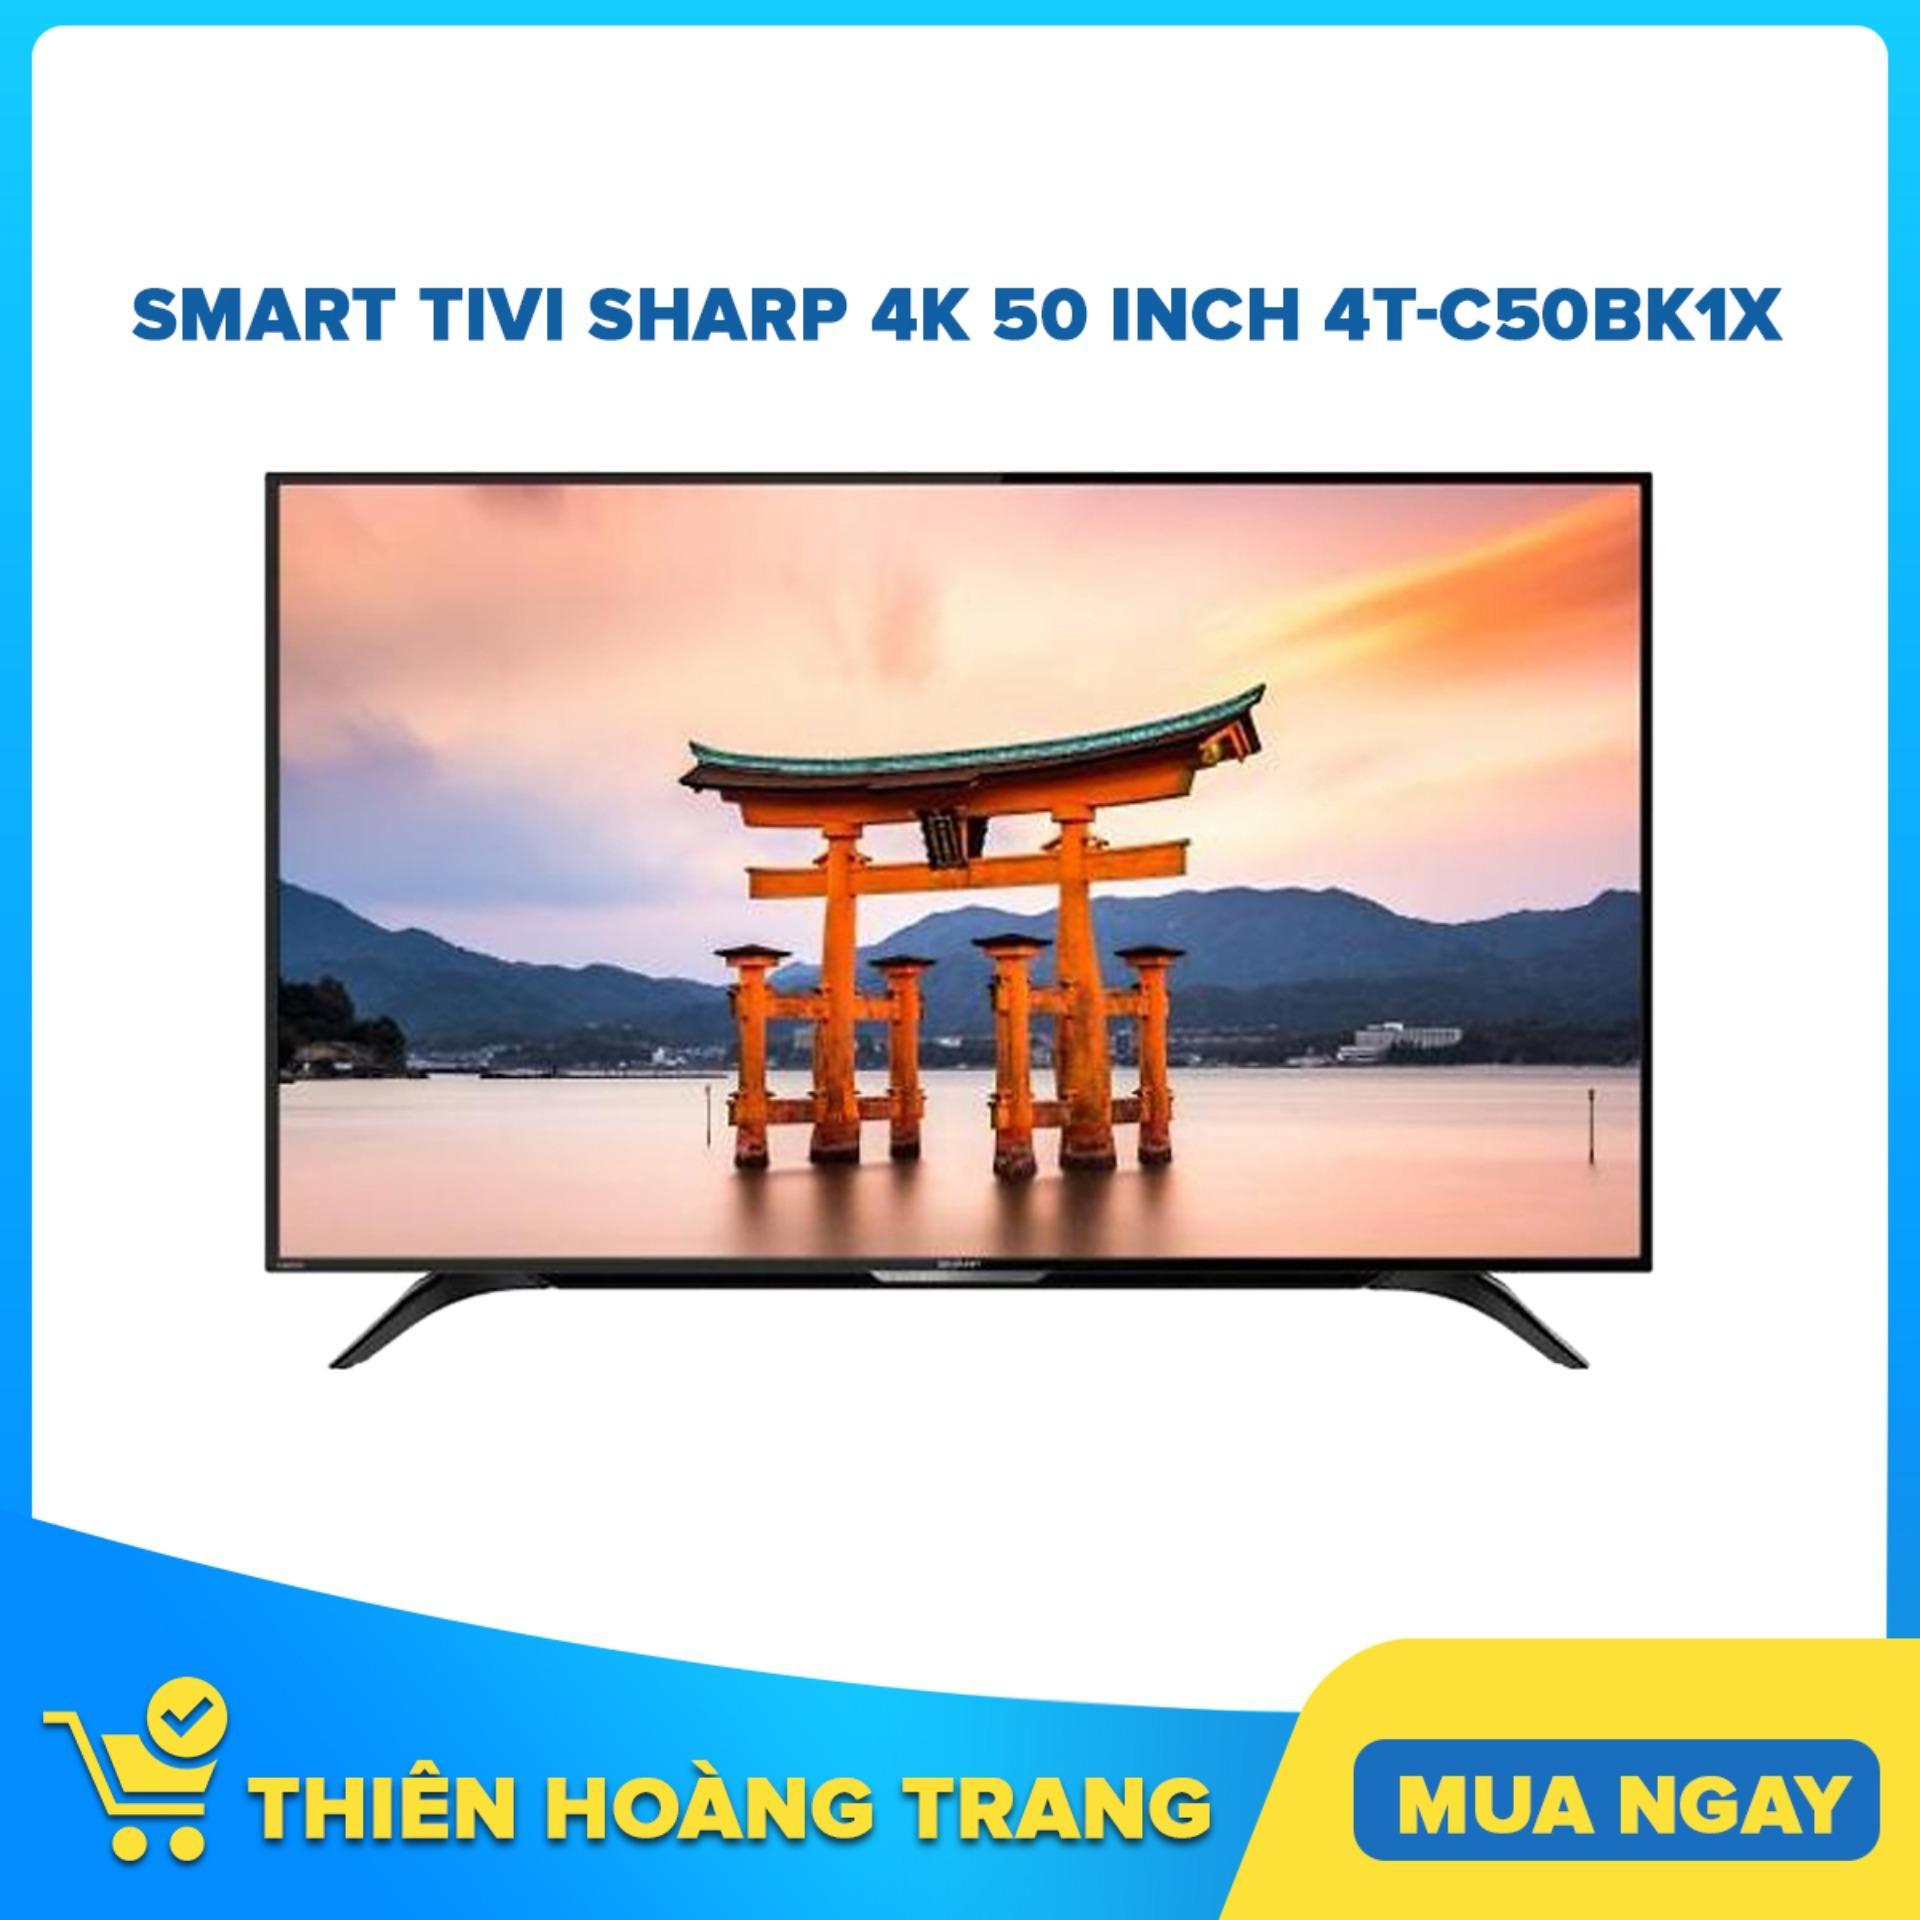 Bảng giá Smart Tivi Sharp 4K 50 inch 4T-C50BK1X